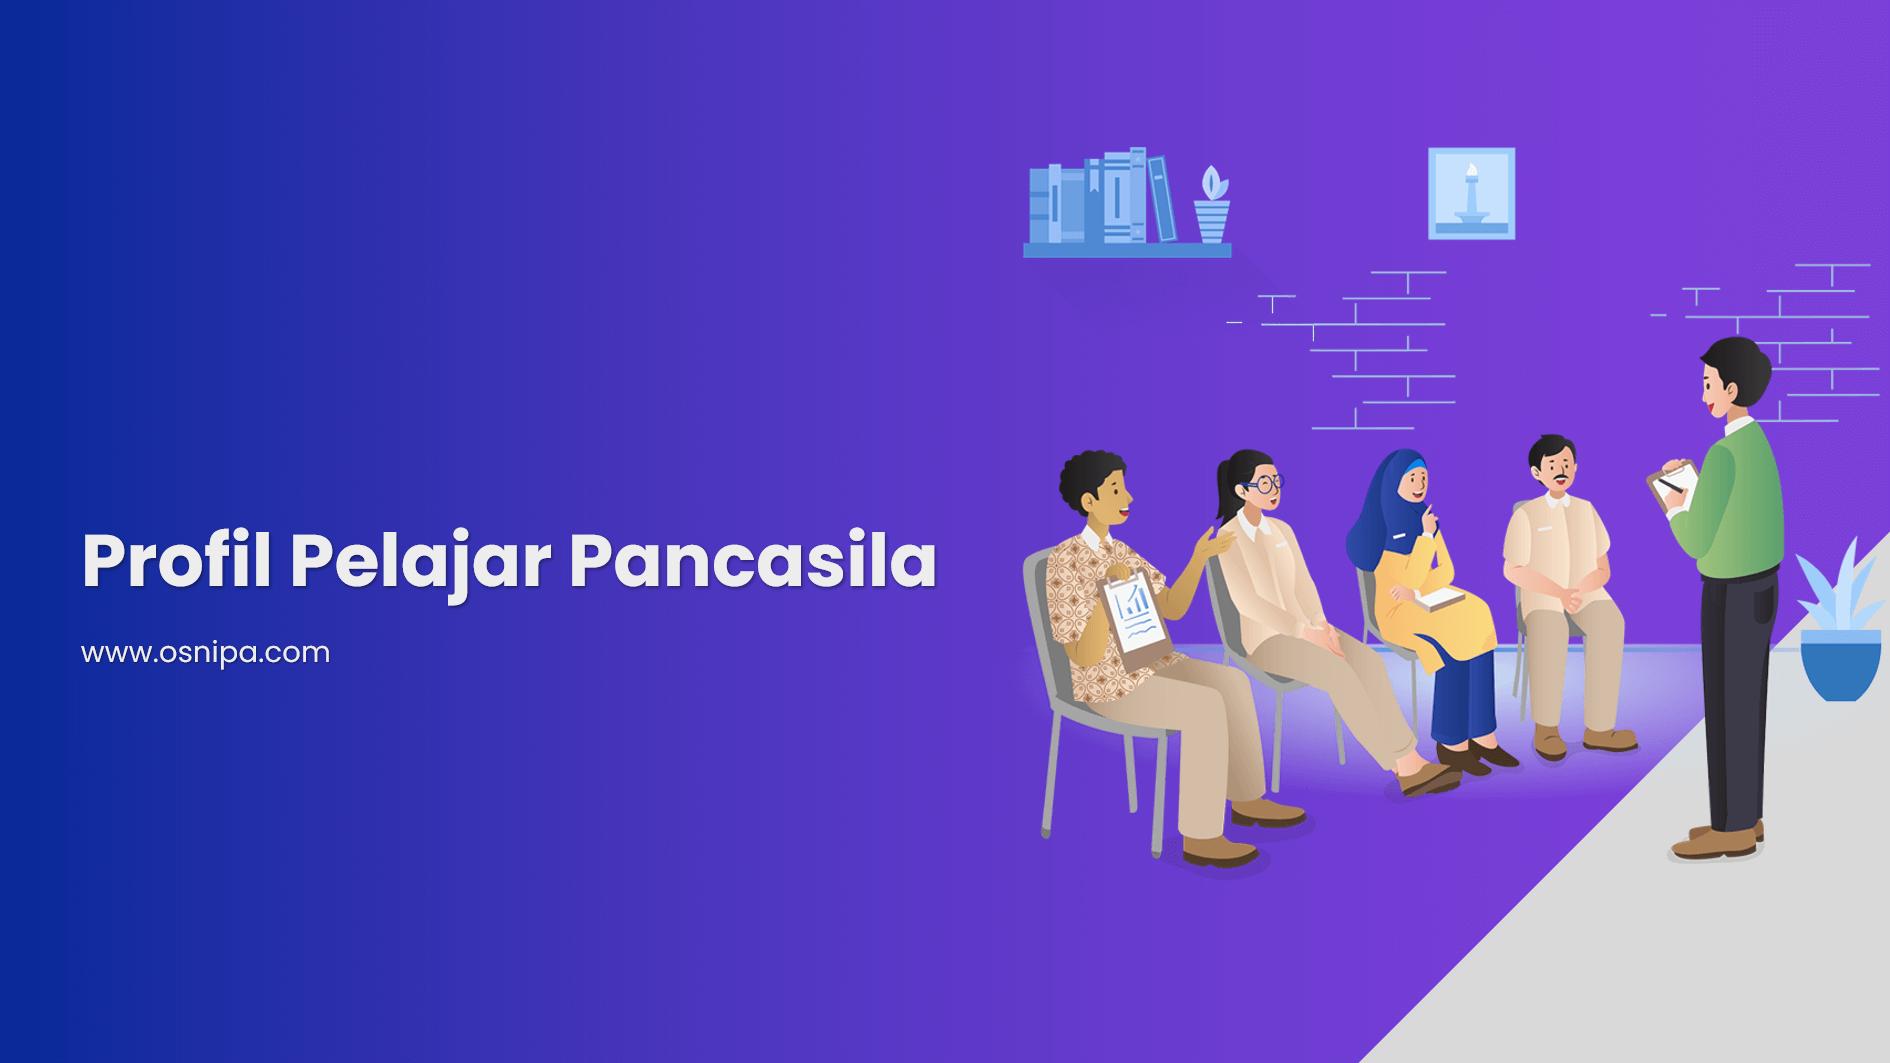 Profil Pelajar Pancasila